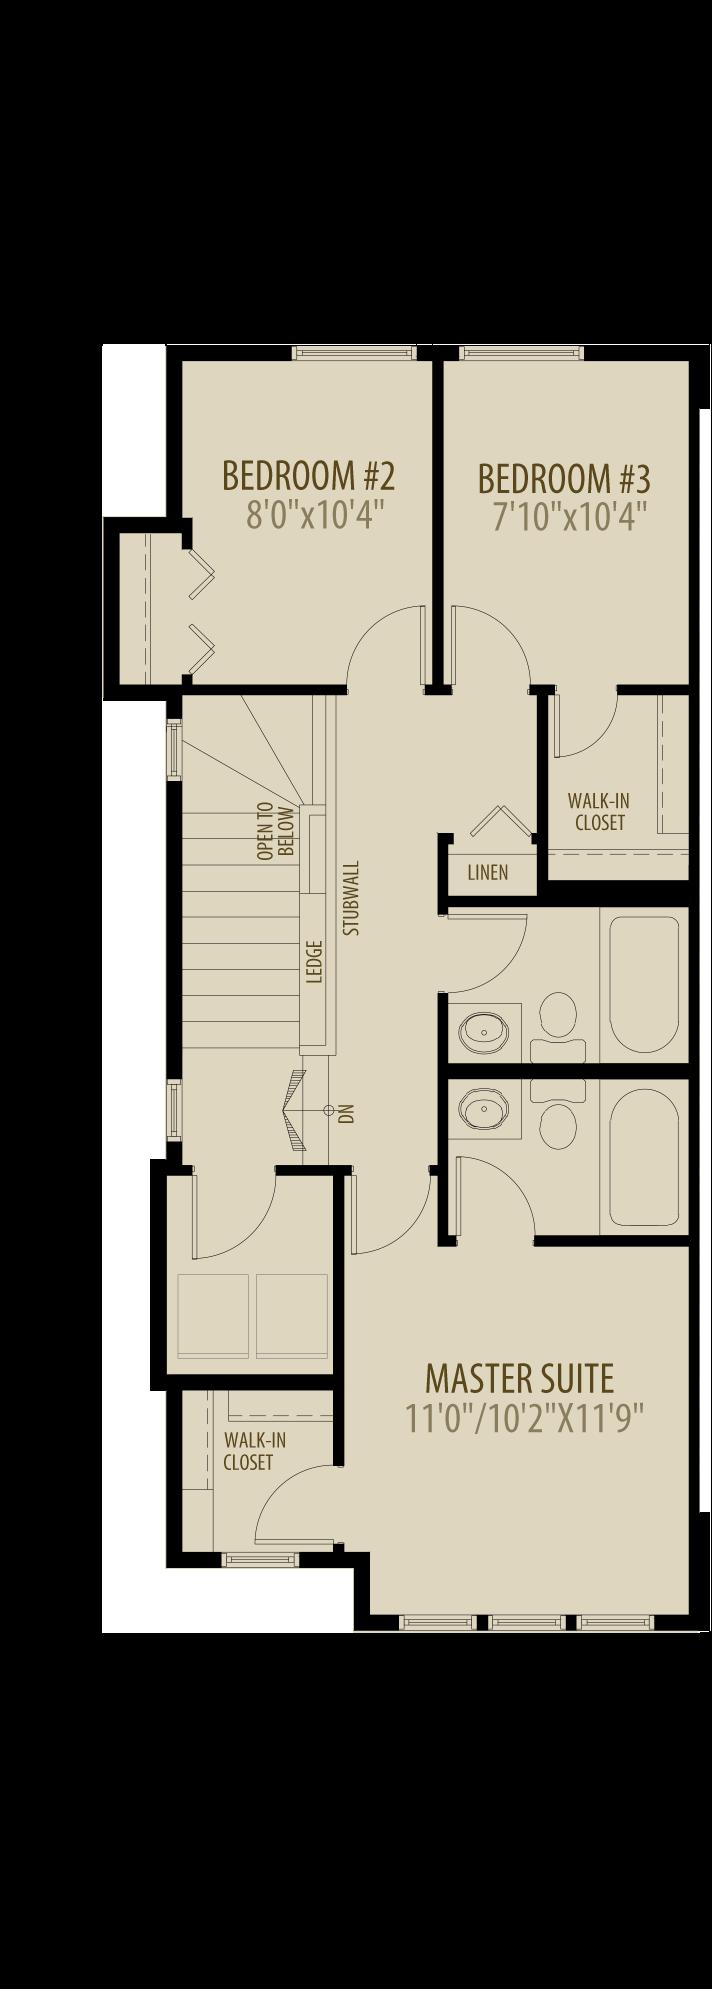 Revised Upper Floor adds 15 sq ft